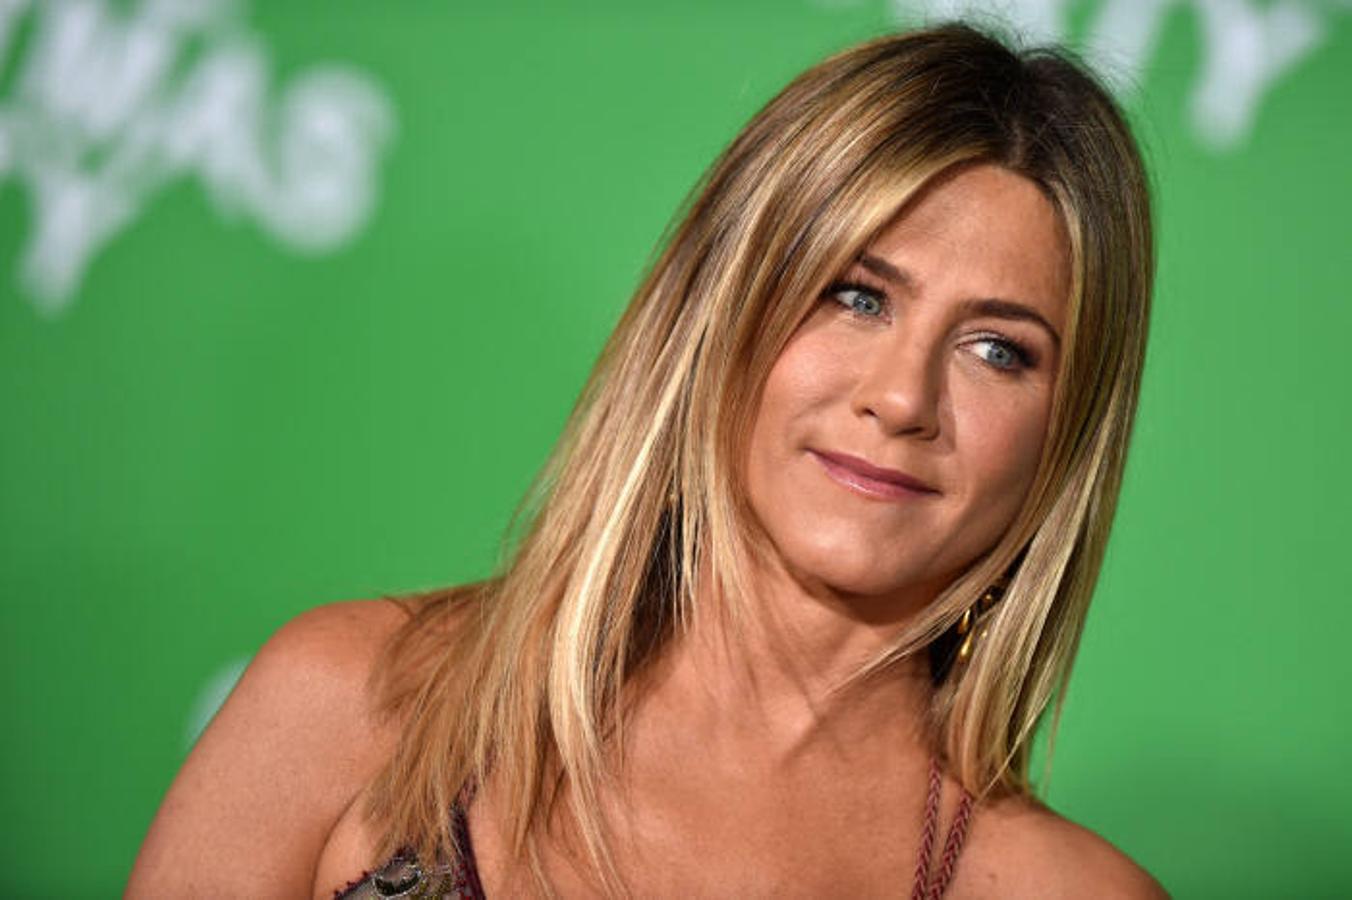 Jennifer Aniston, tono tostado pero no demasiado oscuro.